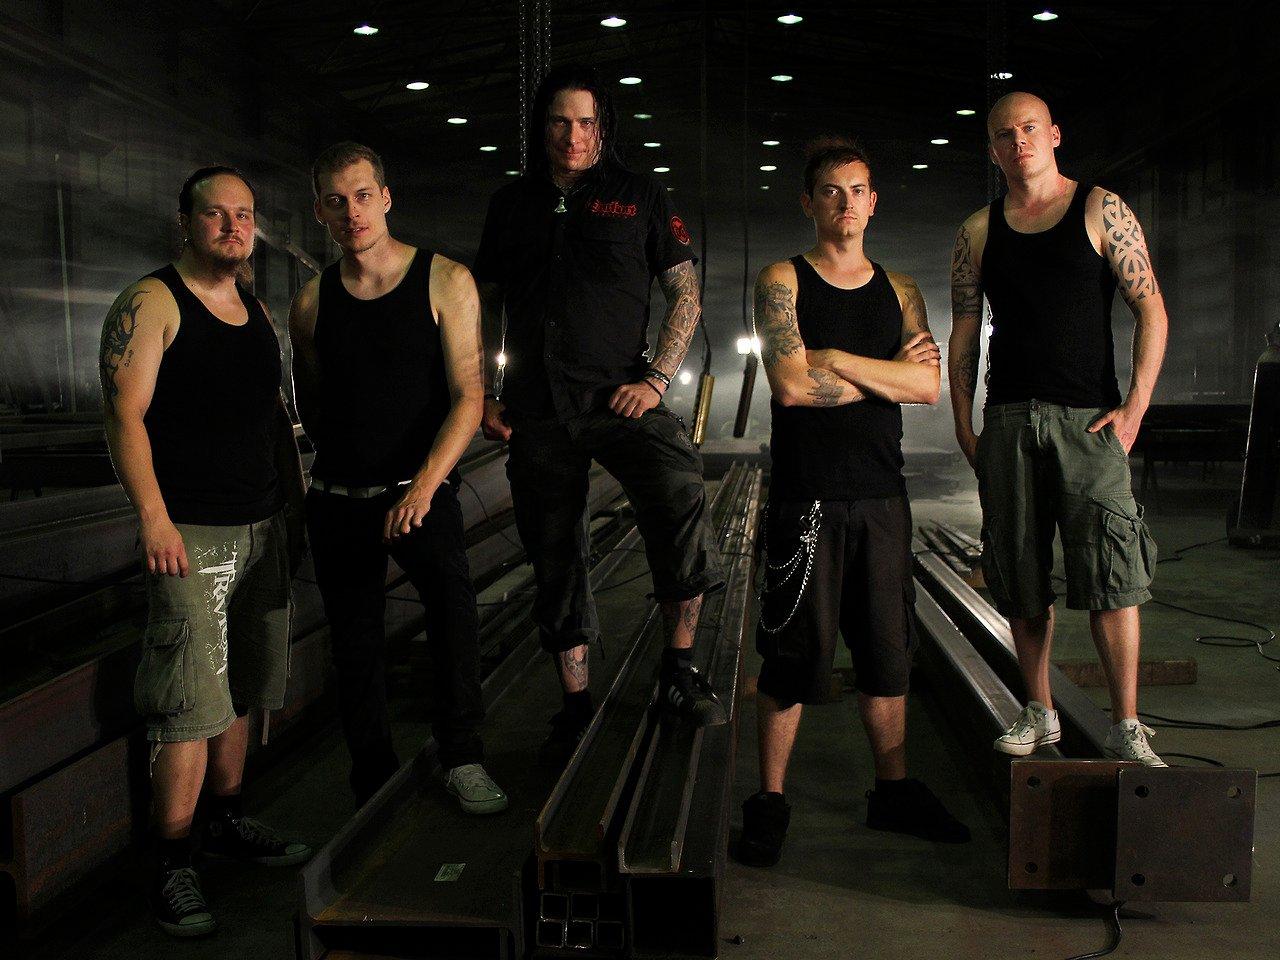 Suomalainen Yhtye